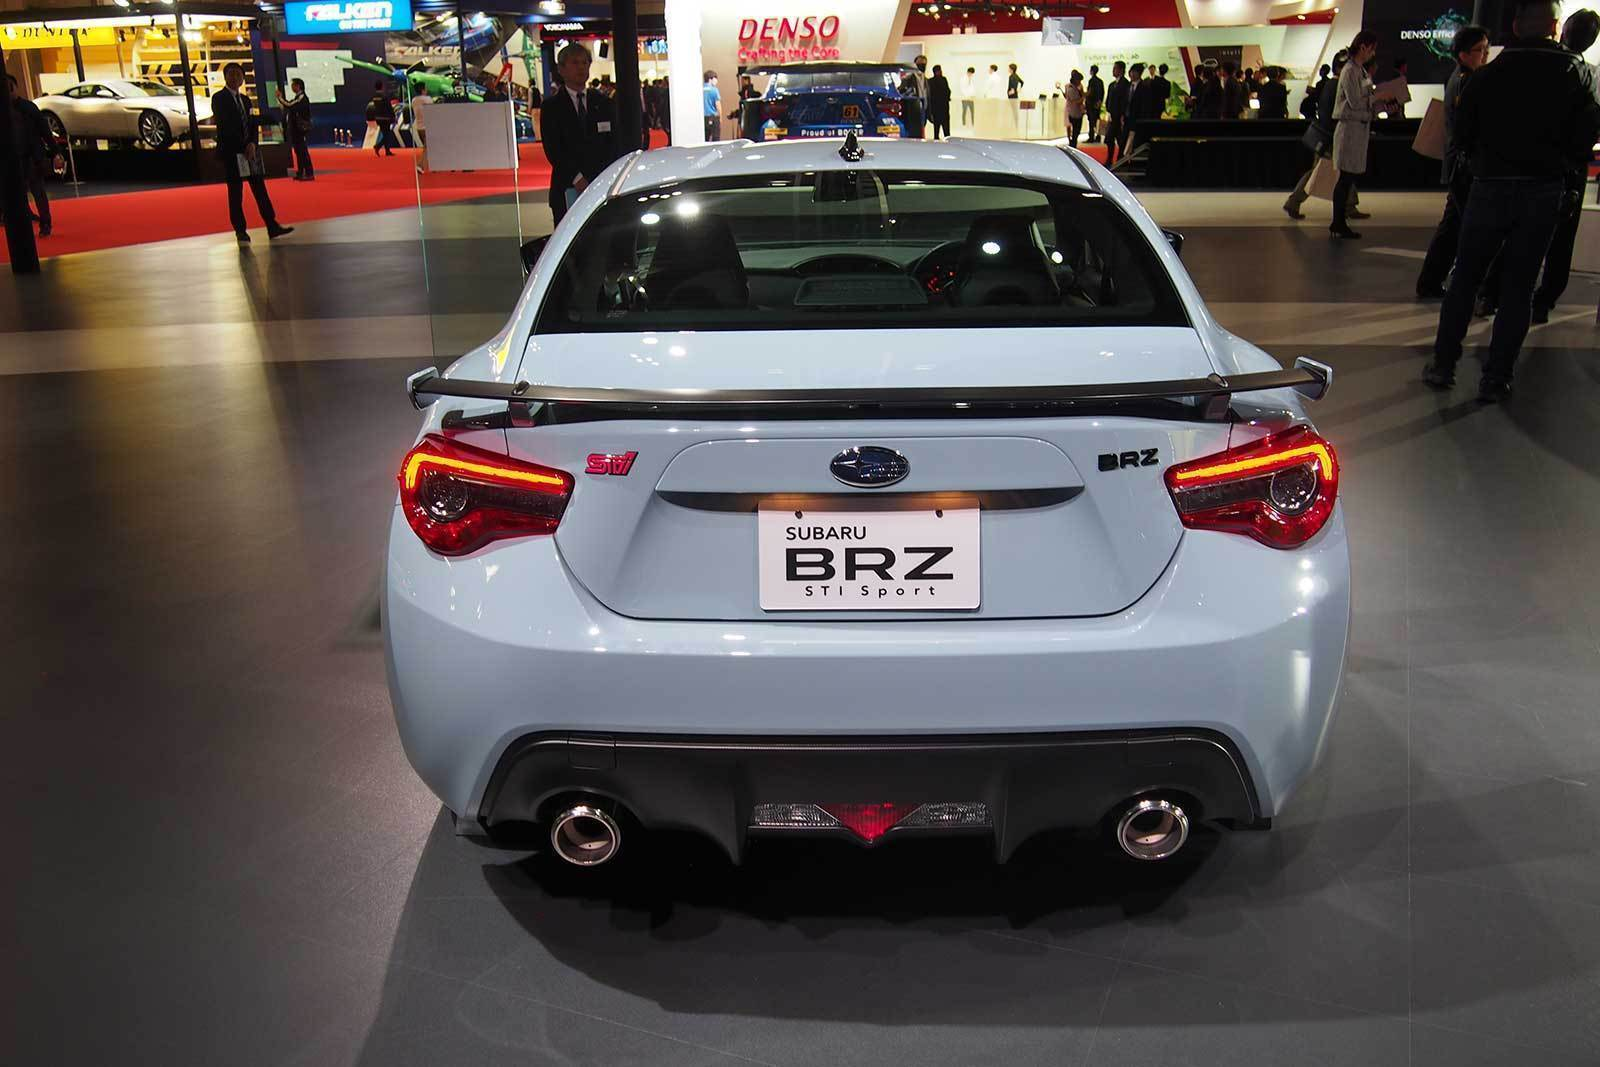 Subaru-BRZ-STI-Sport-02.jpg